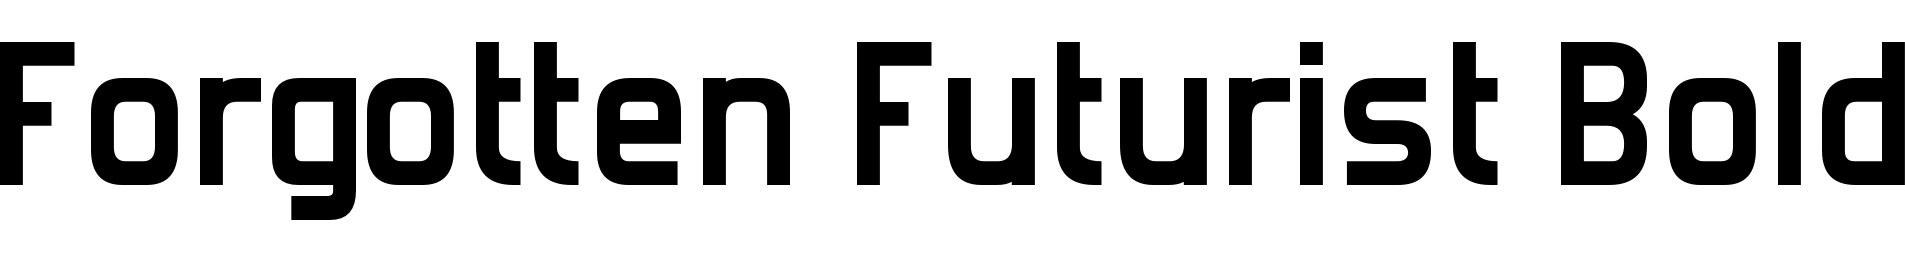 Forgotten Futurist Bold